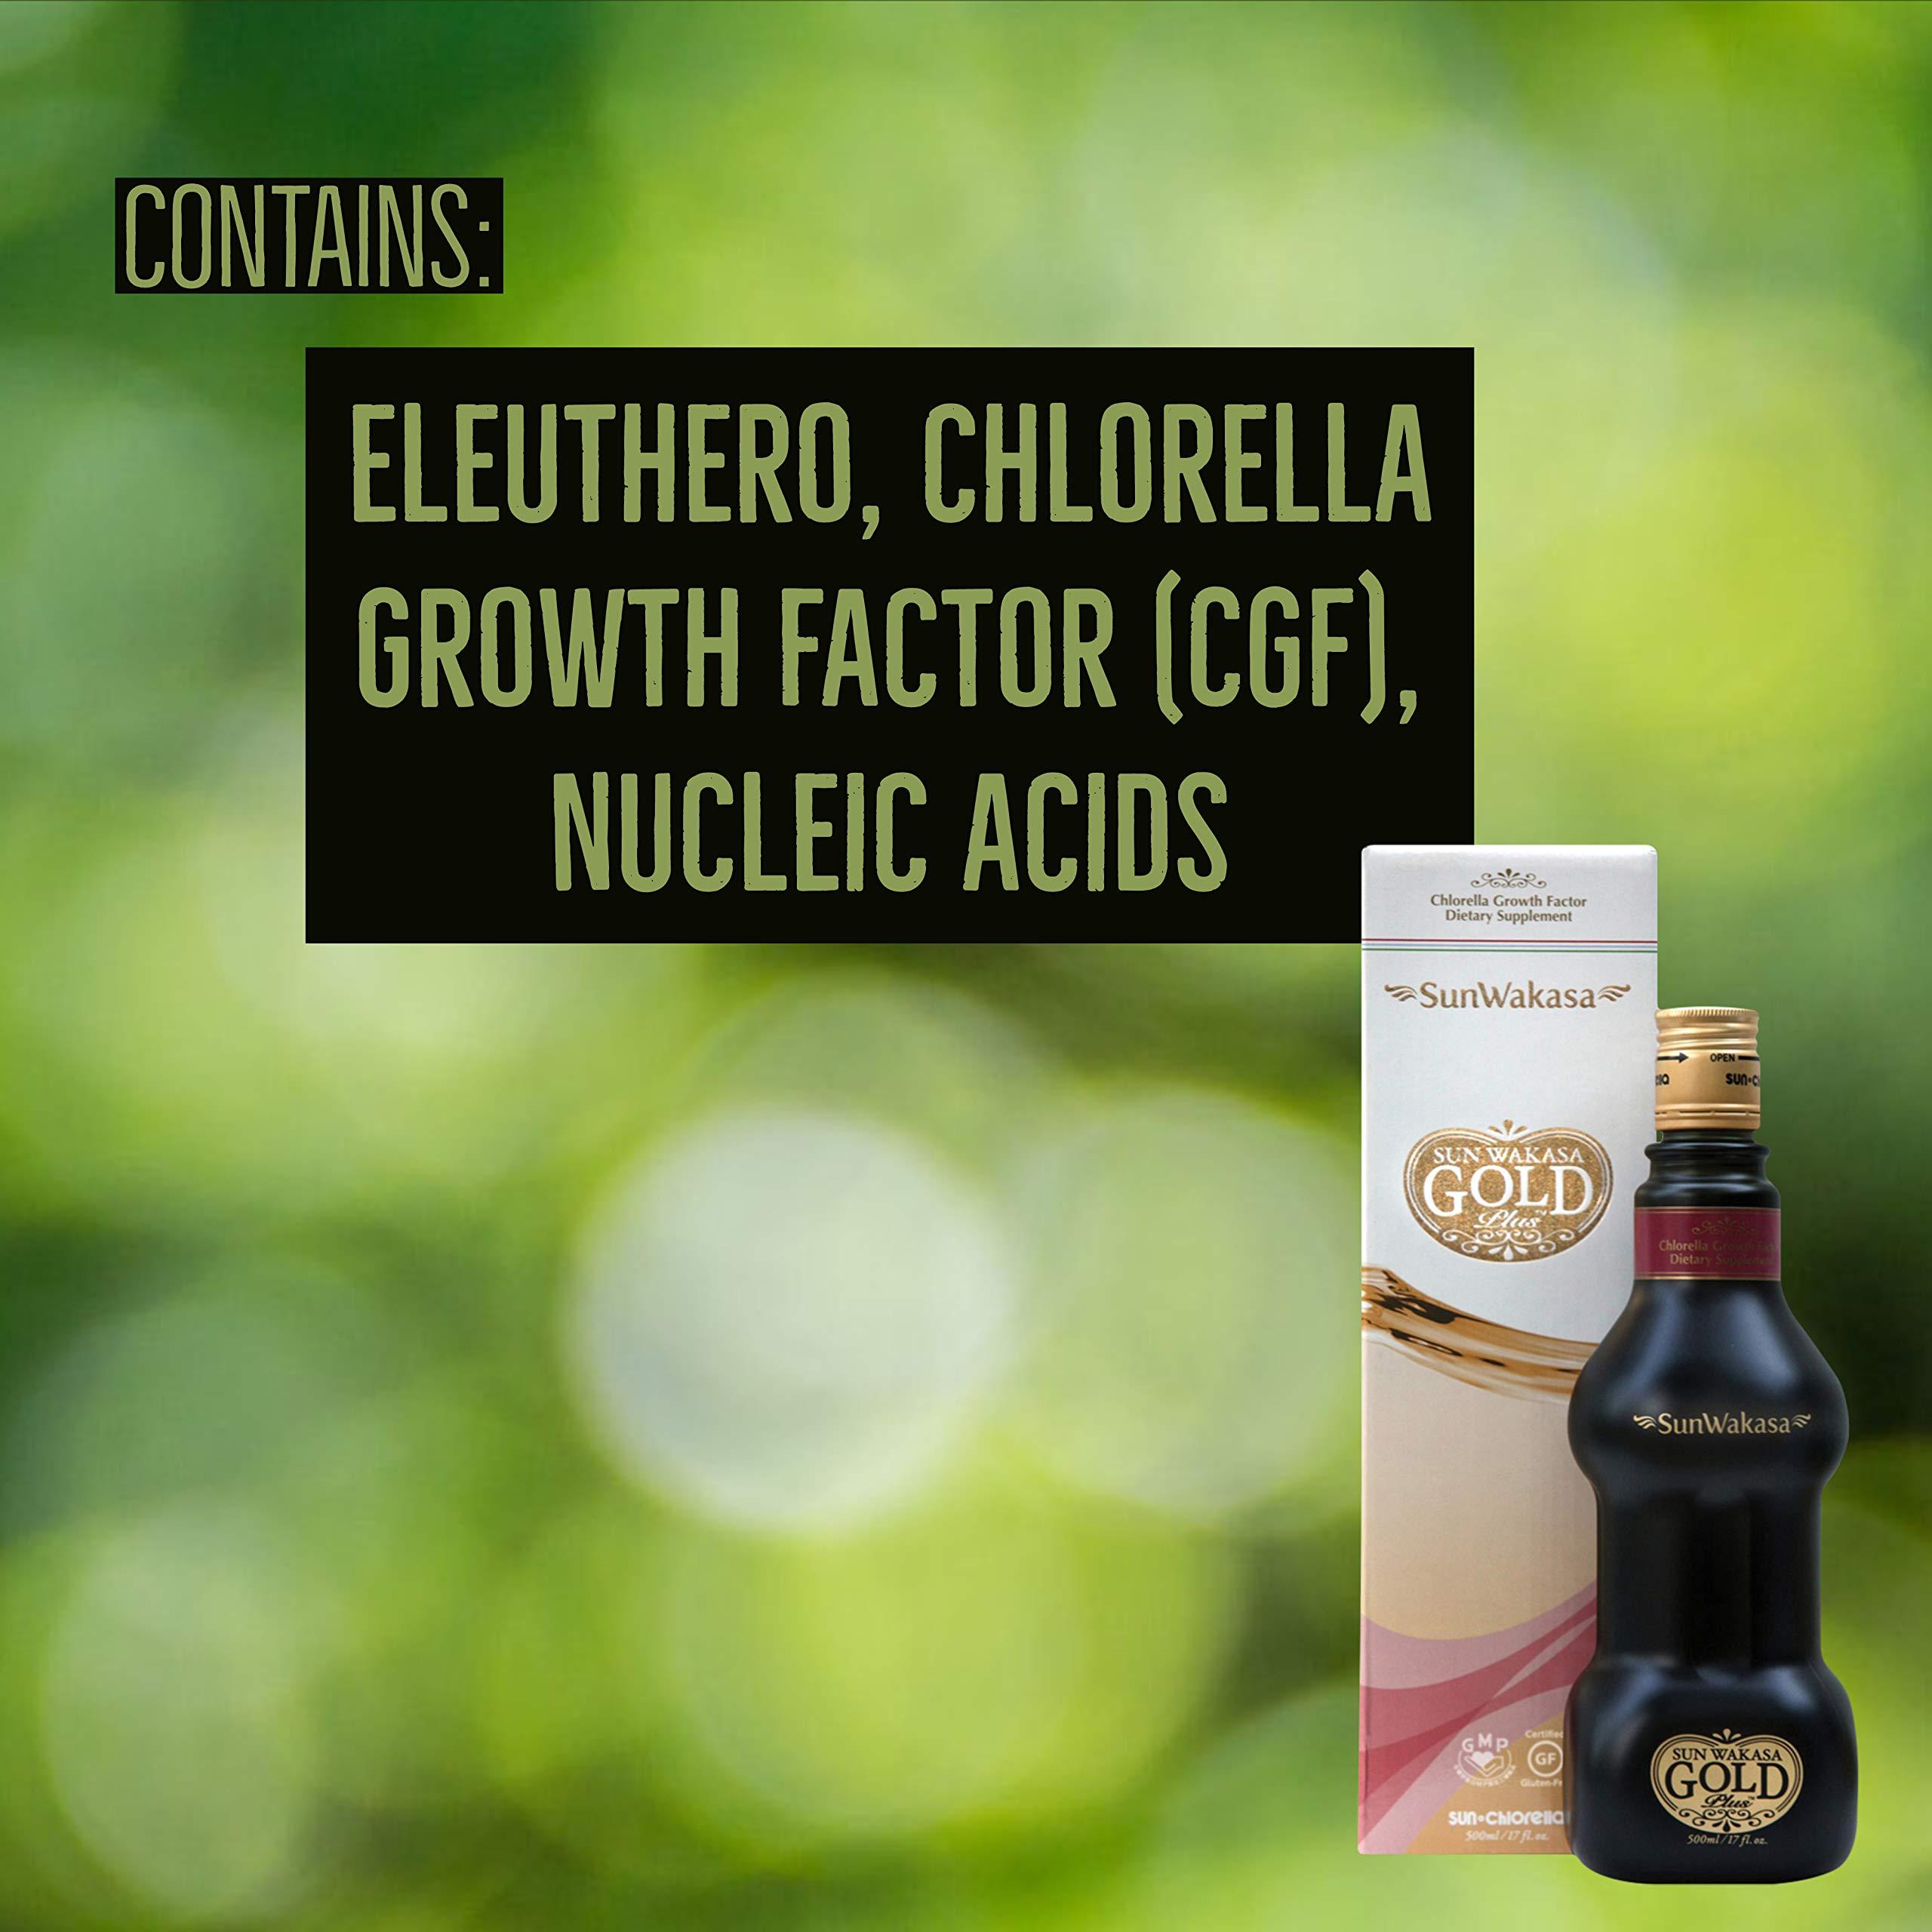 Sun Chlorella- Sun Wakasa Gold with Chlorella Growth Factor- Support Your Health On A Cellular Level (17 Fluid Ounce) by Sun Chlorella (Image #8)